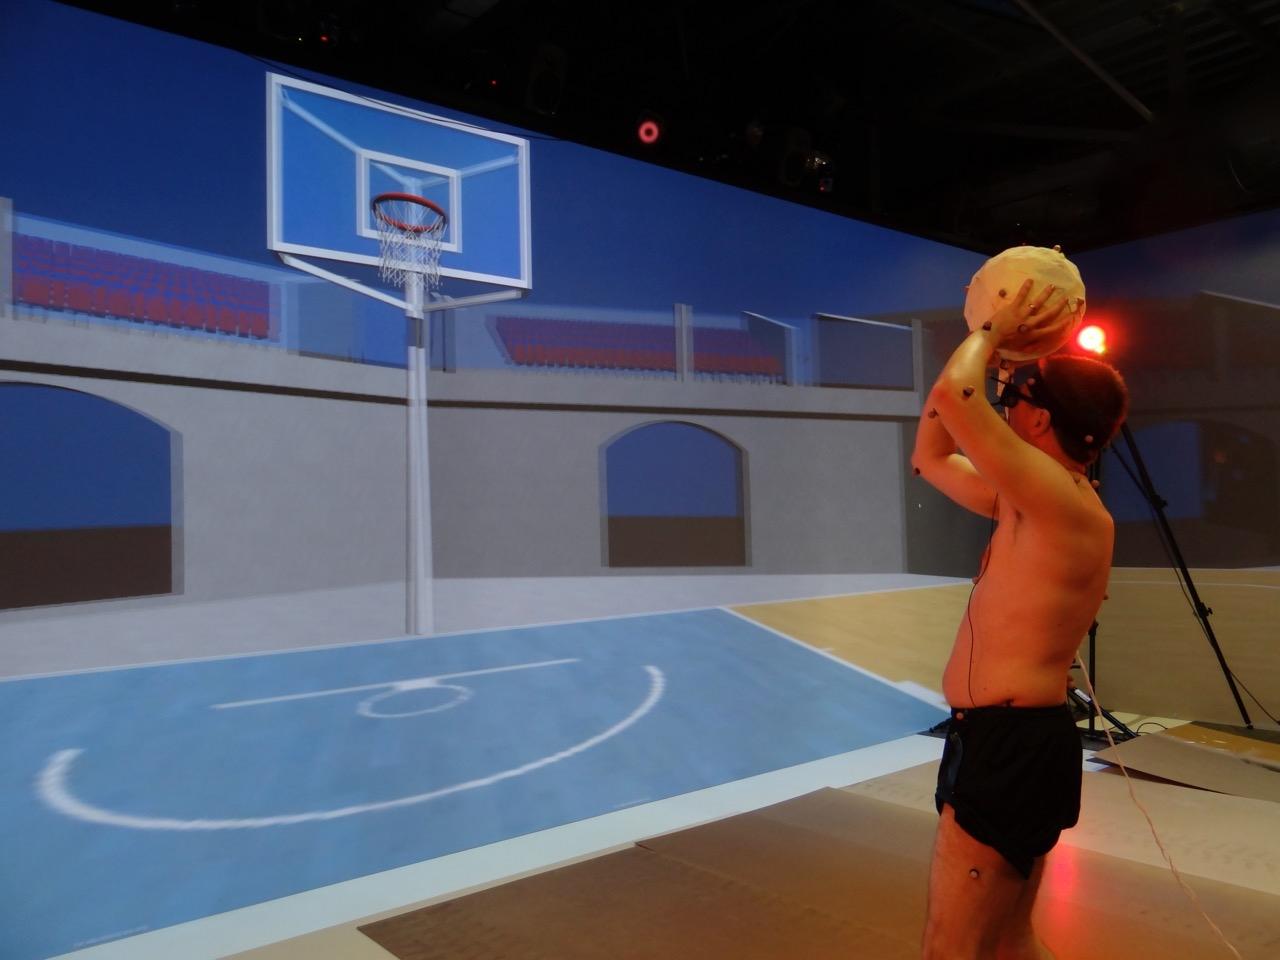 Basketball simulation